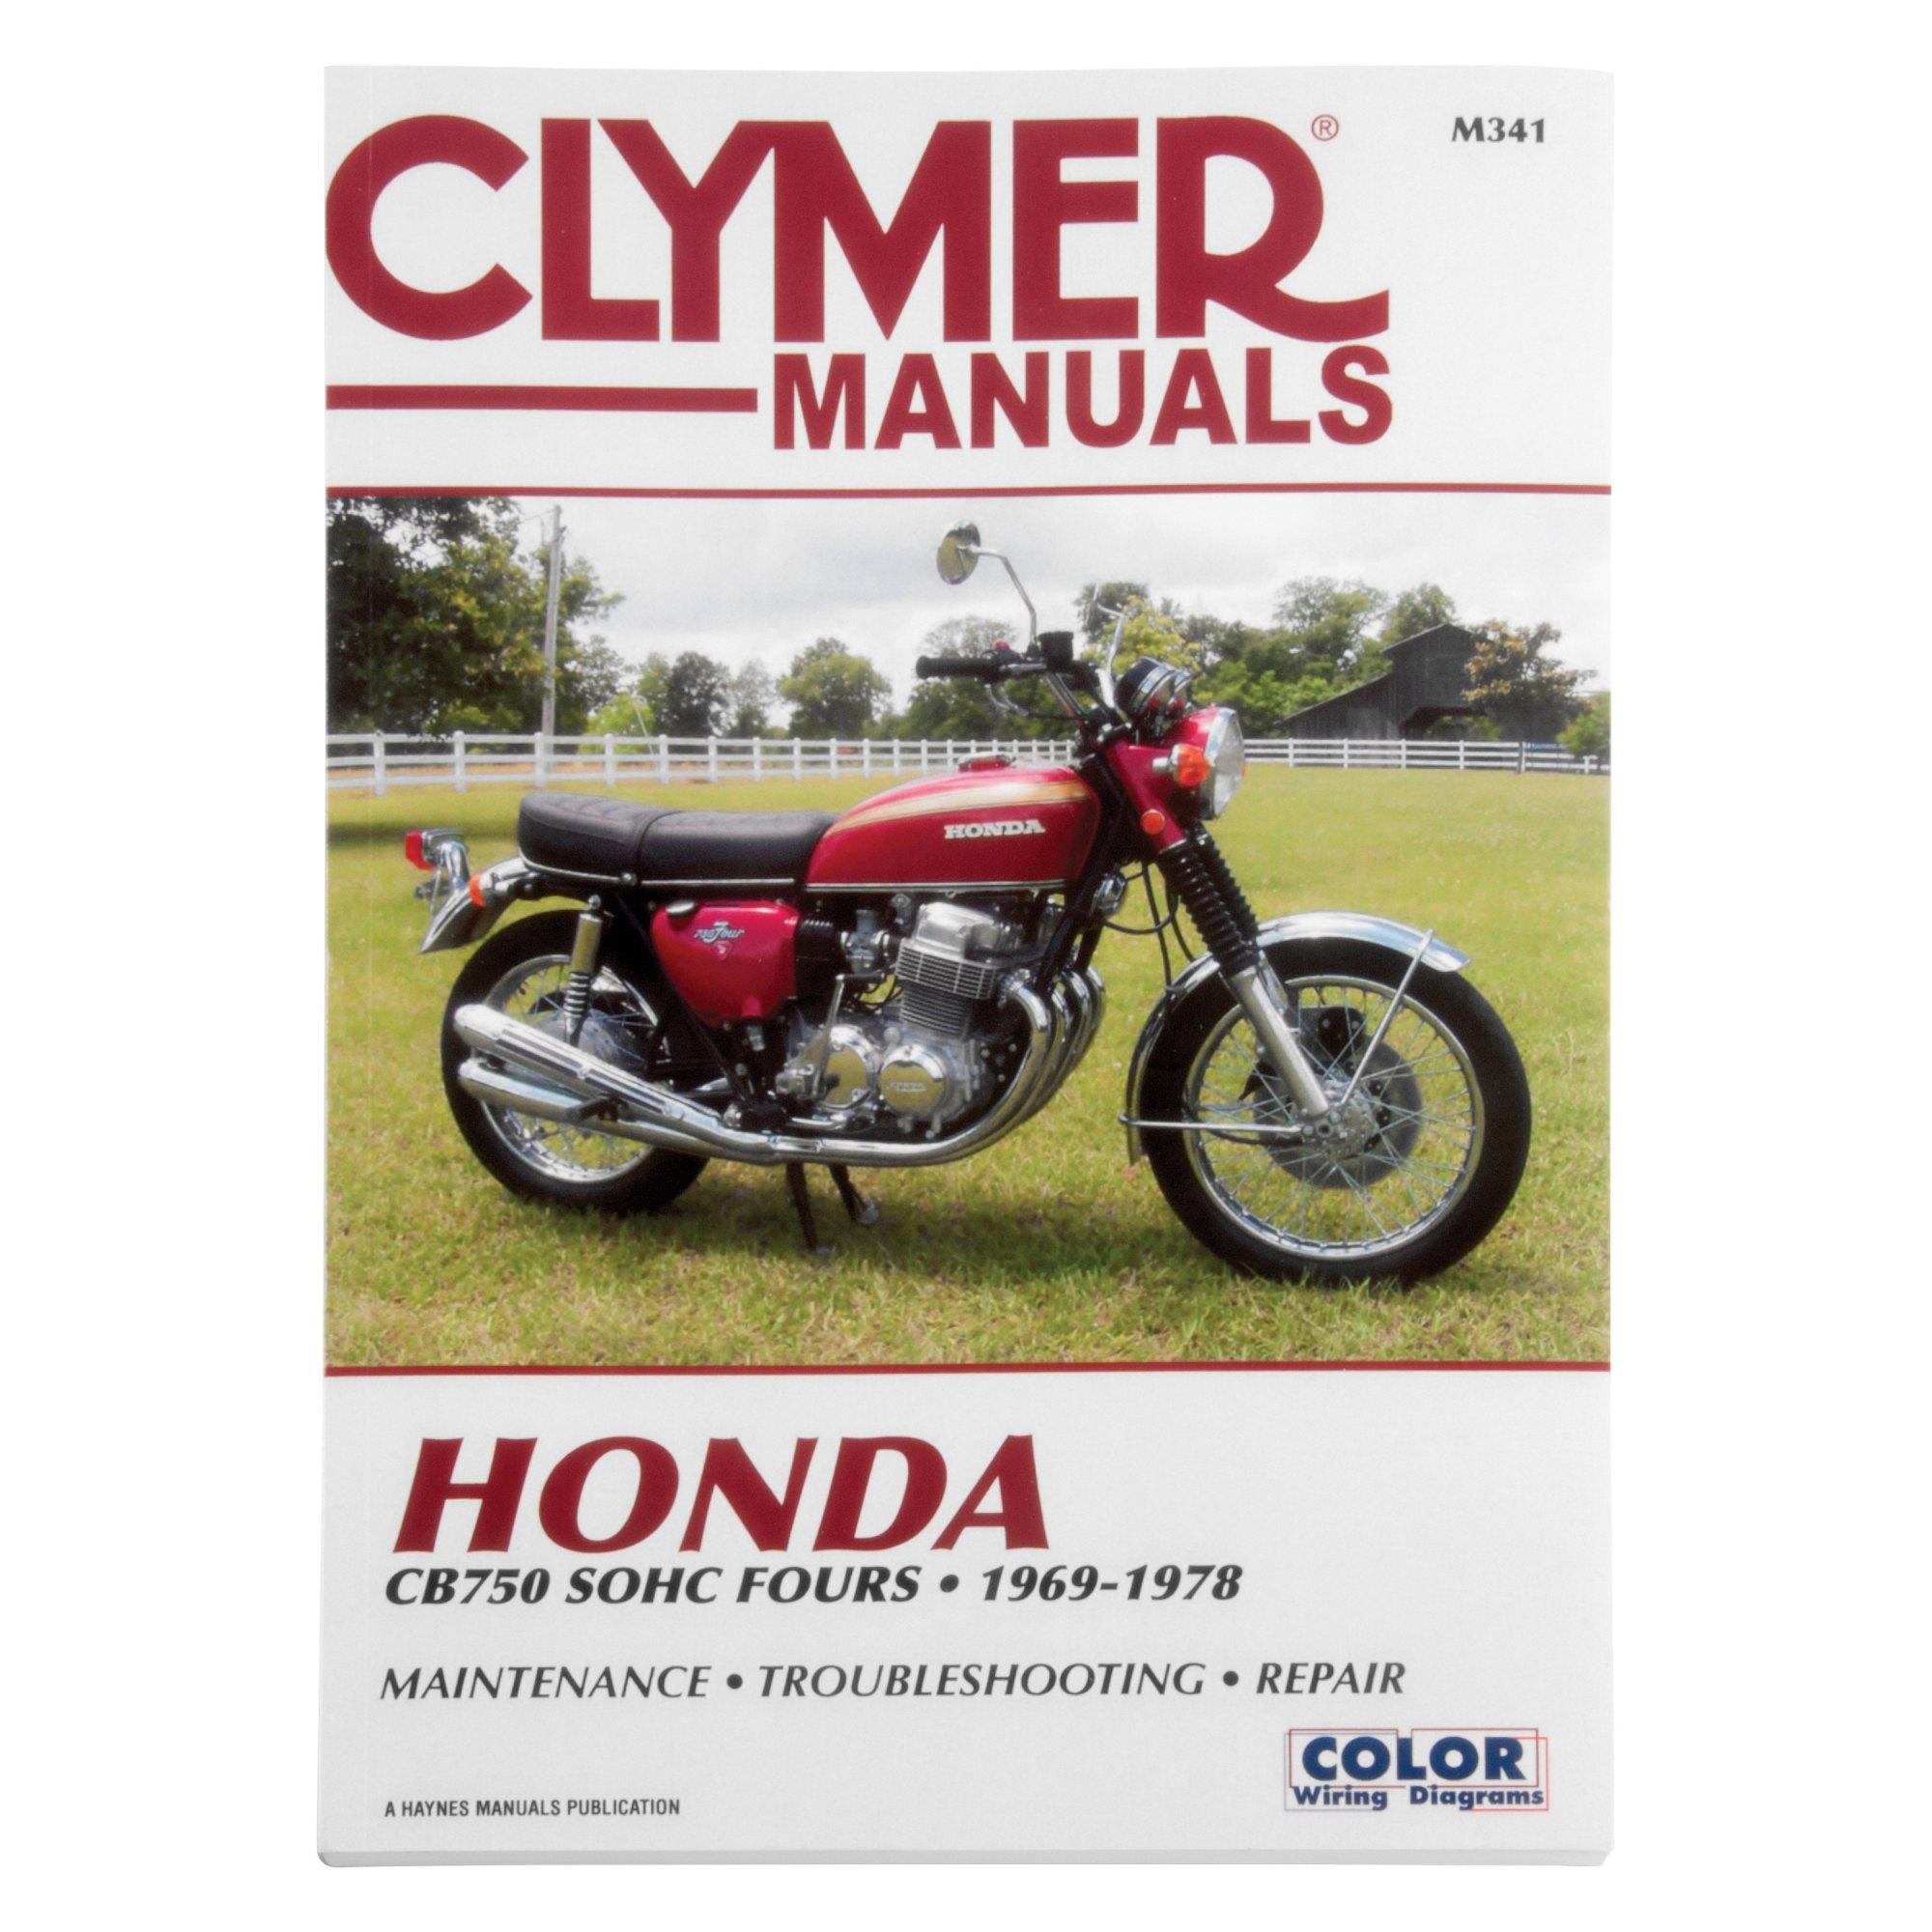 hight resolution of clymer m341 honda cb750 sohc 1969 1978 manual motorcycleid comclymer honda cb750 sohc 1969